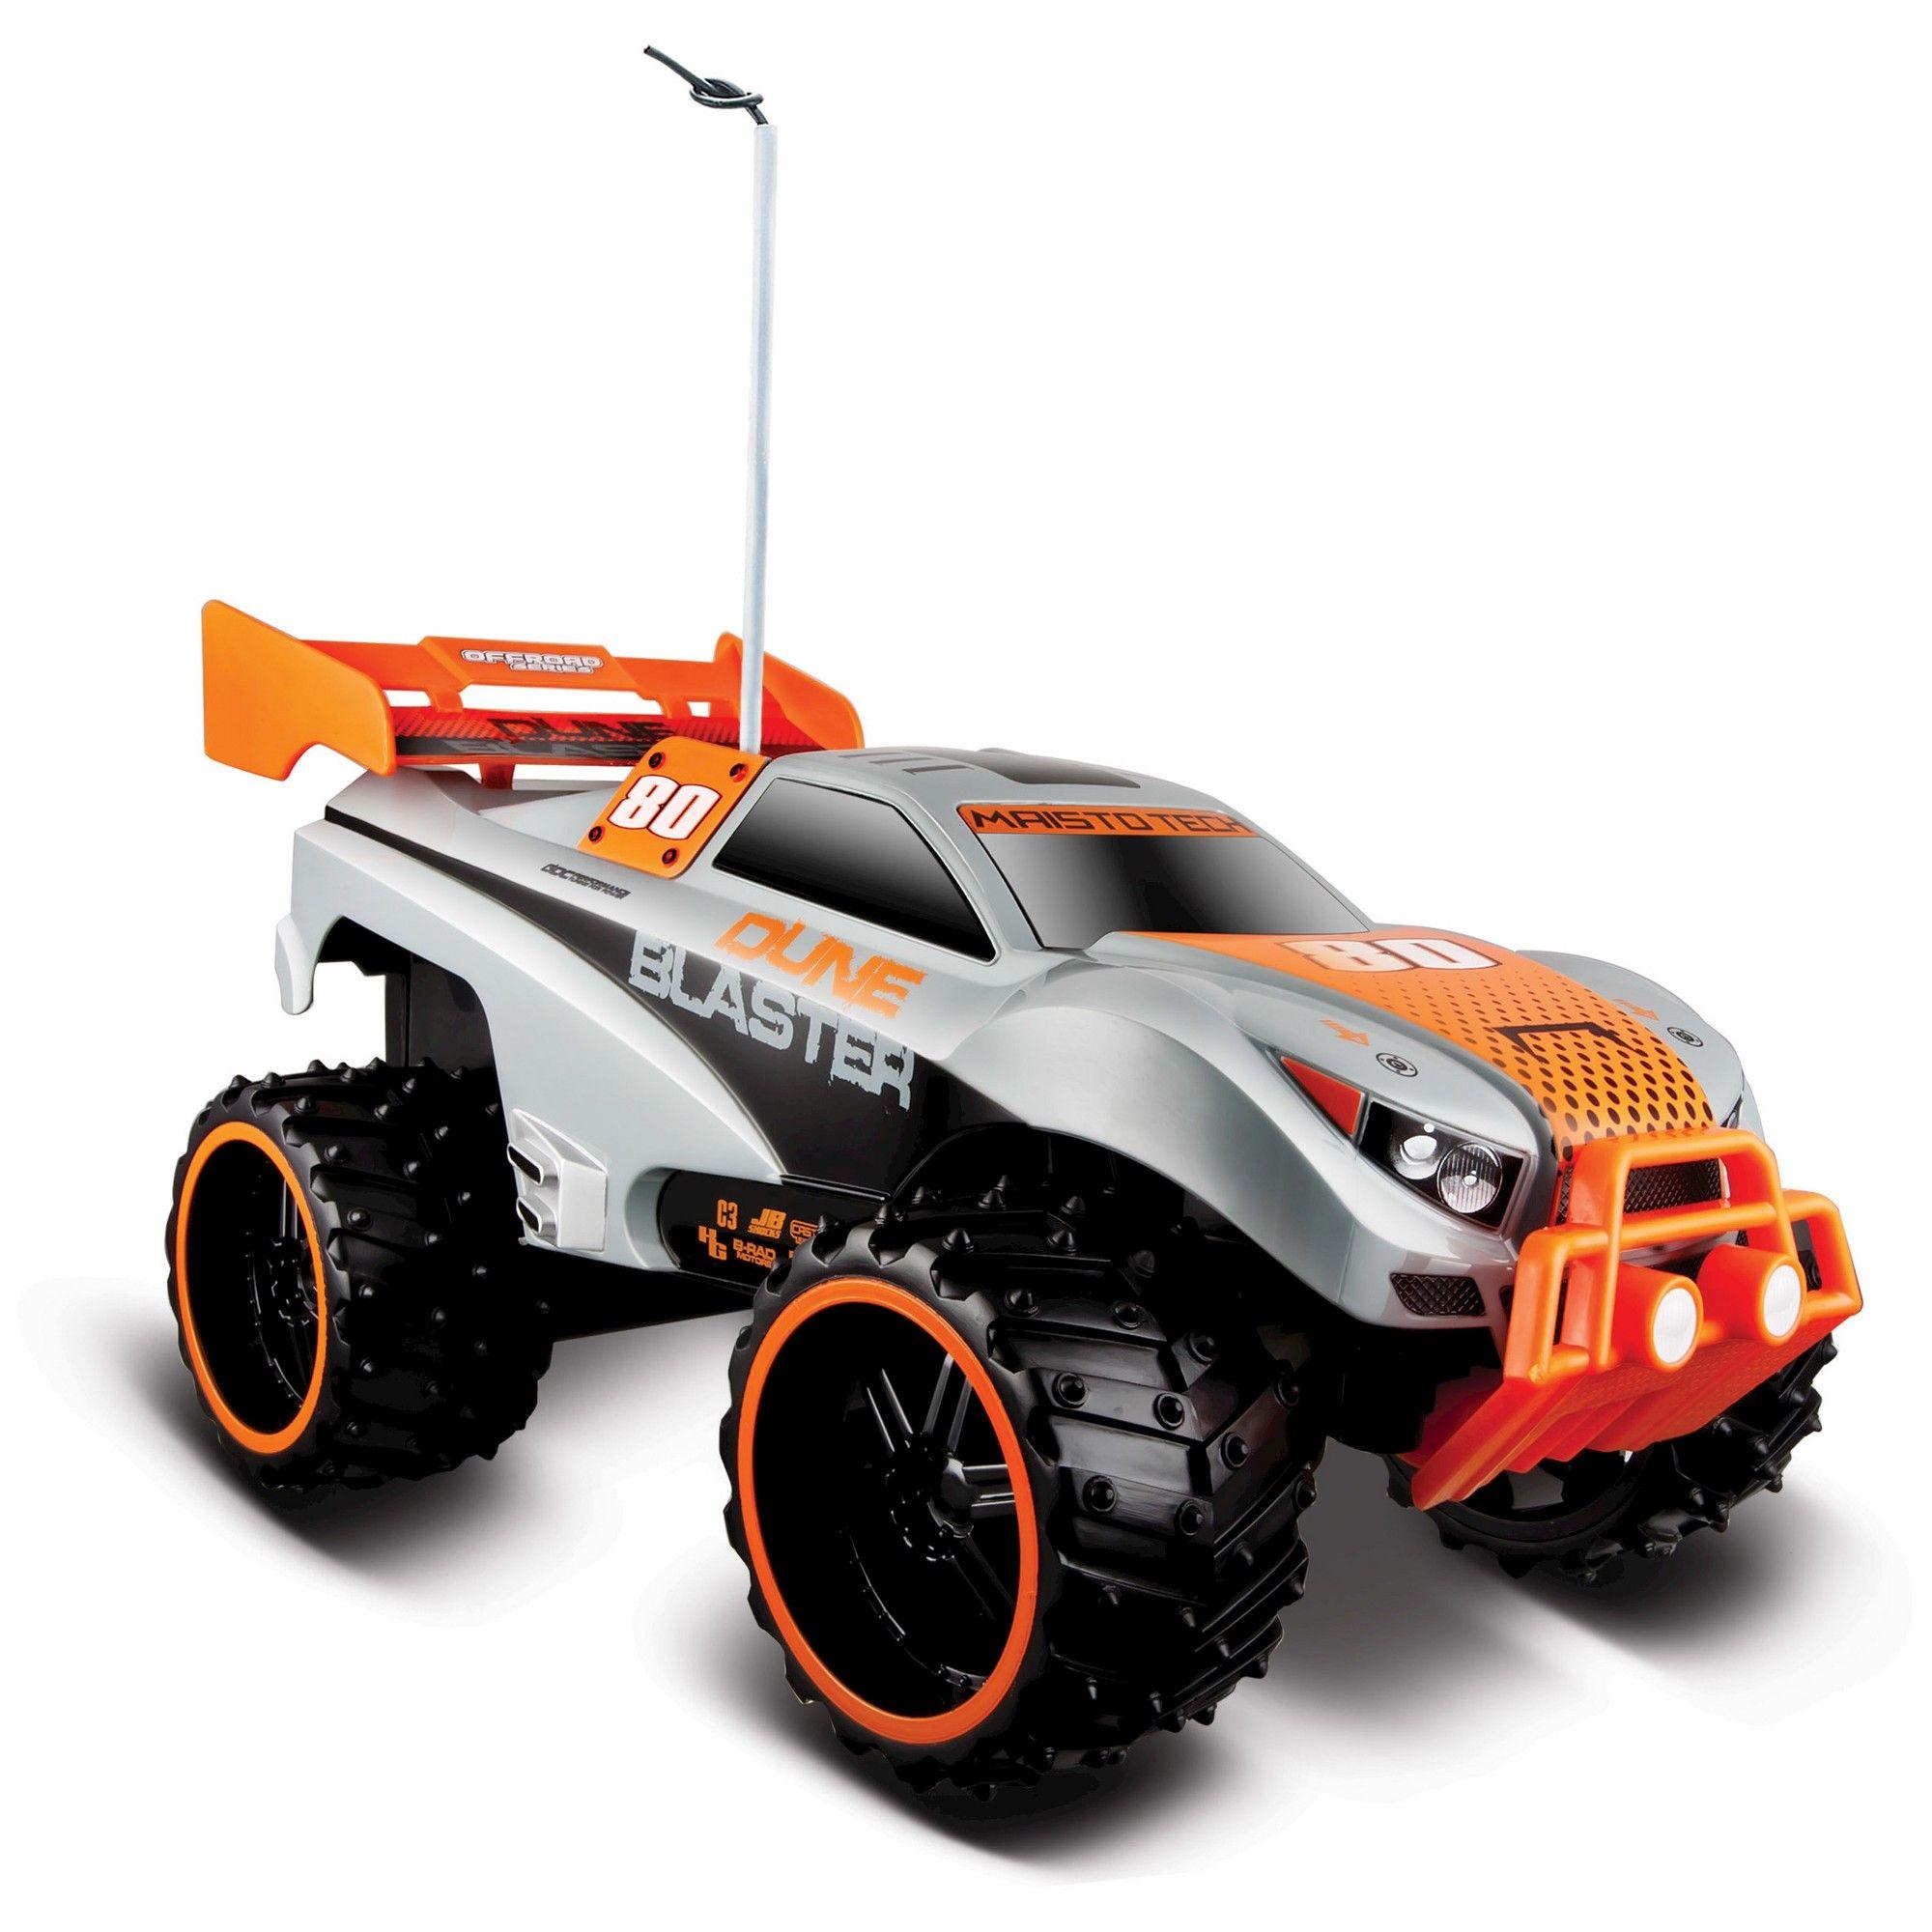 Maisto Remote Control RC OffRoad Dune Blaster 116